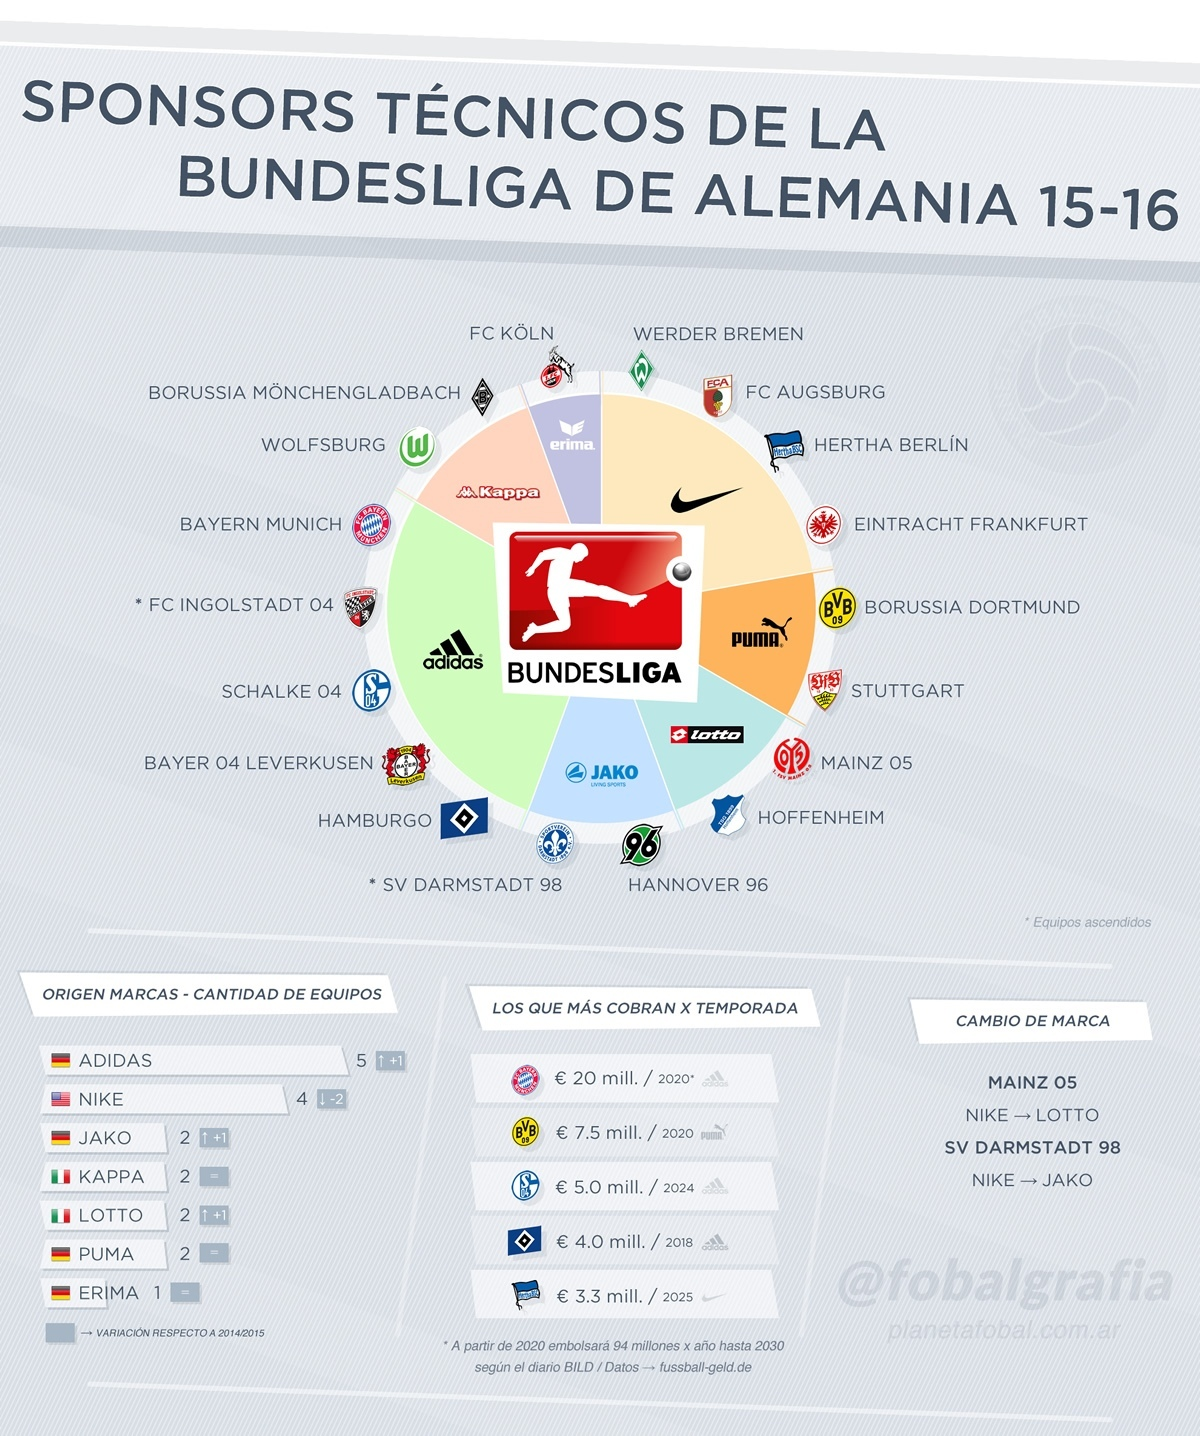 Las marcas de la Bundesliga 15-16